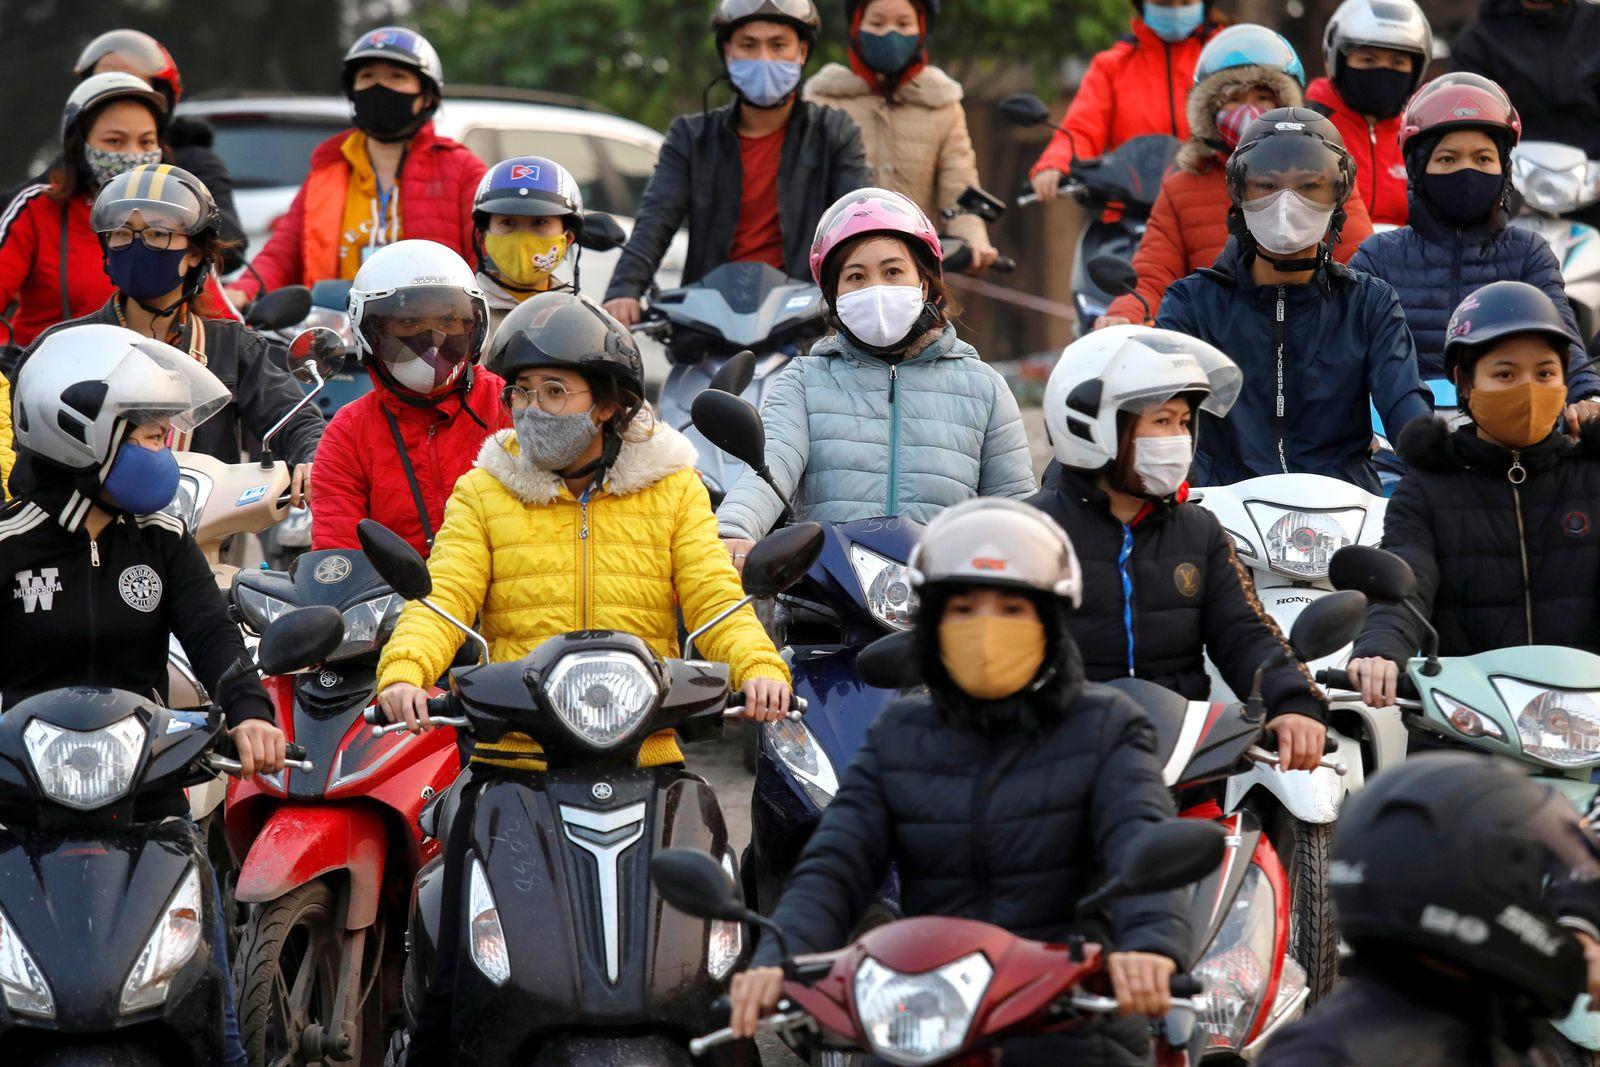 Coronavirus disease (COVID-19) outbreak in Hai Duong province